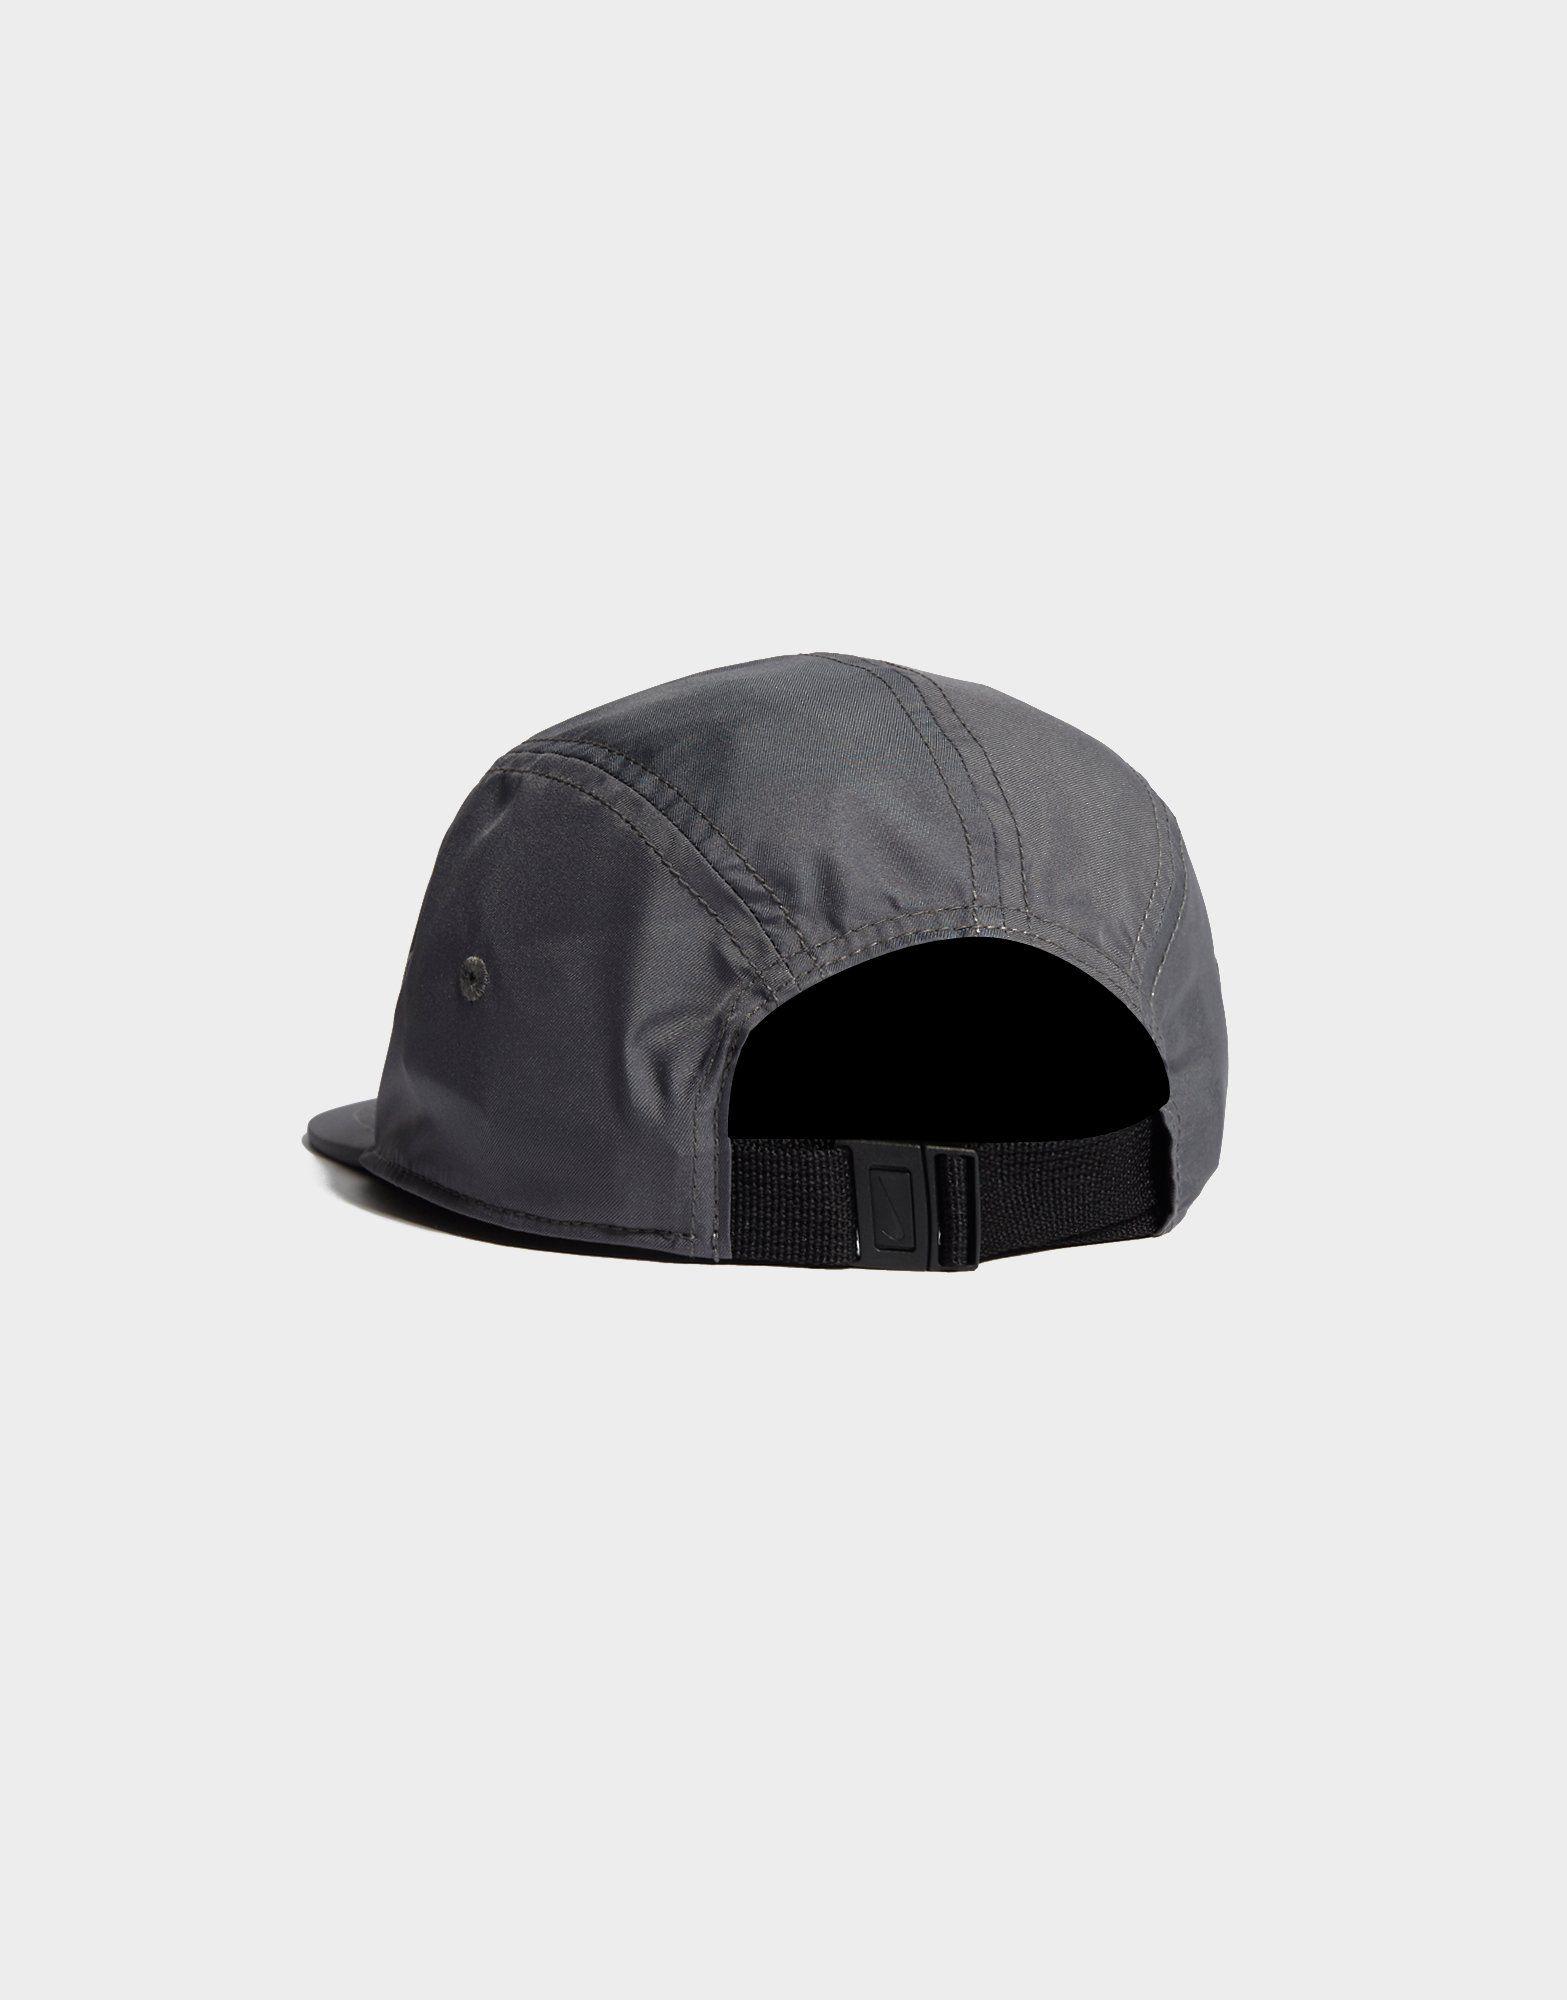 Nike Air Max 84 Cappellino